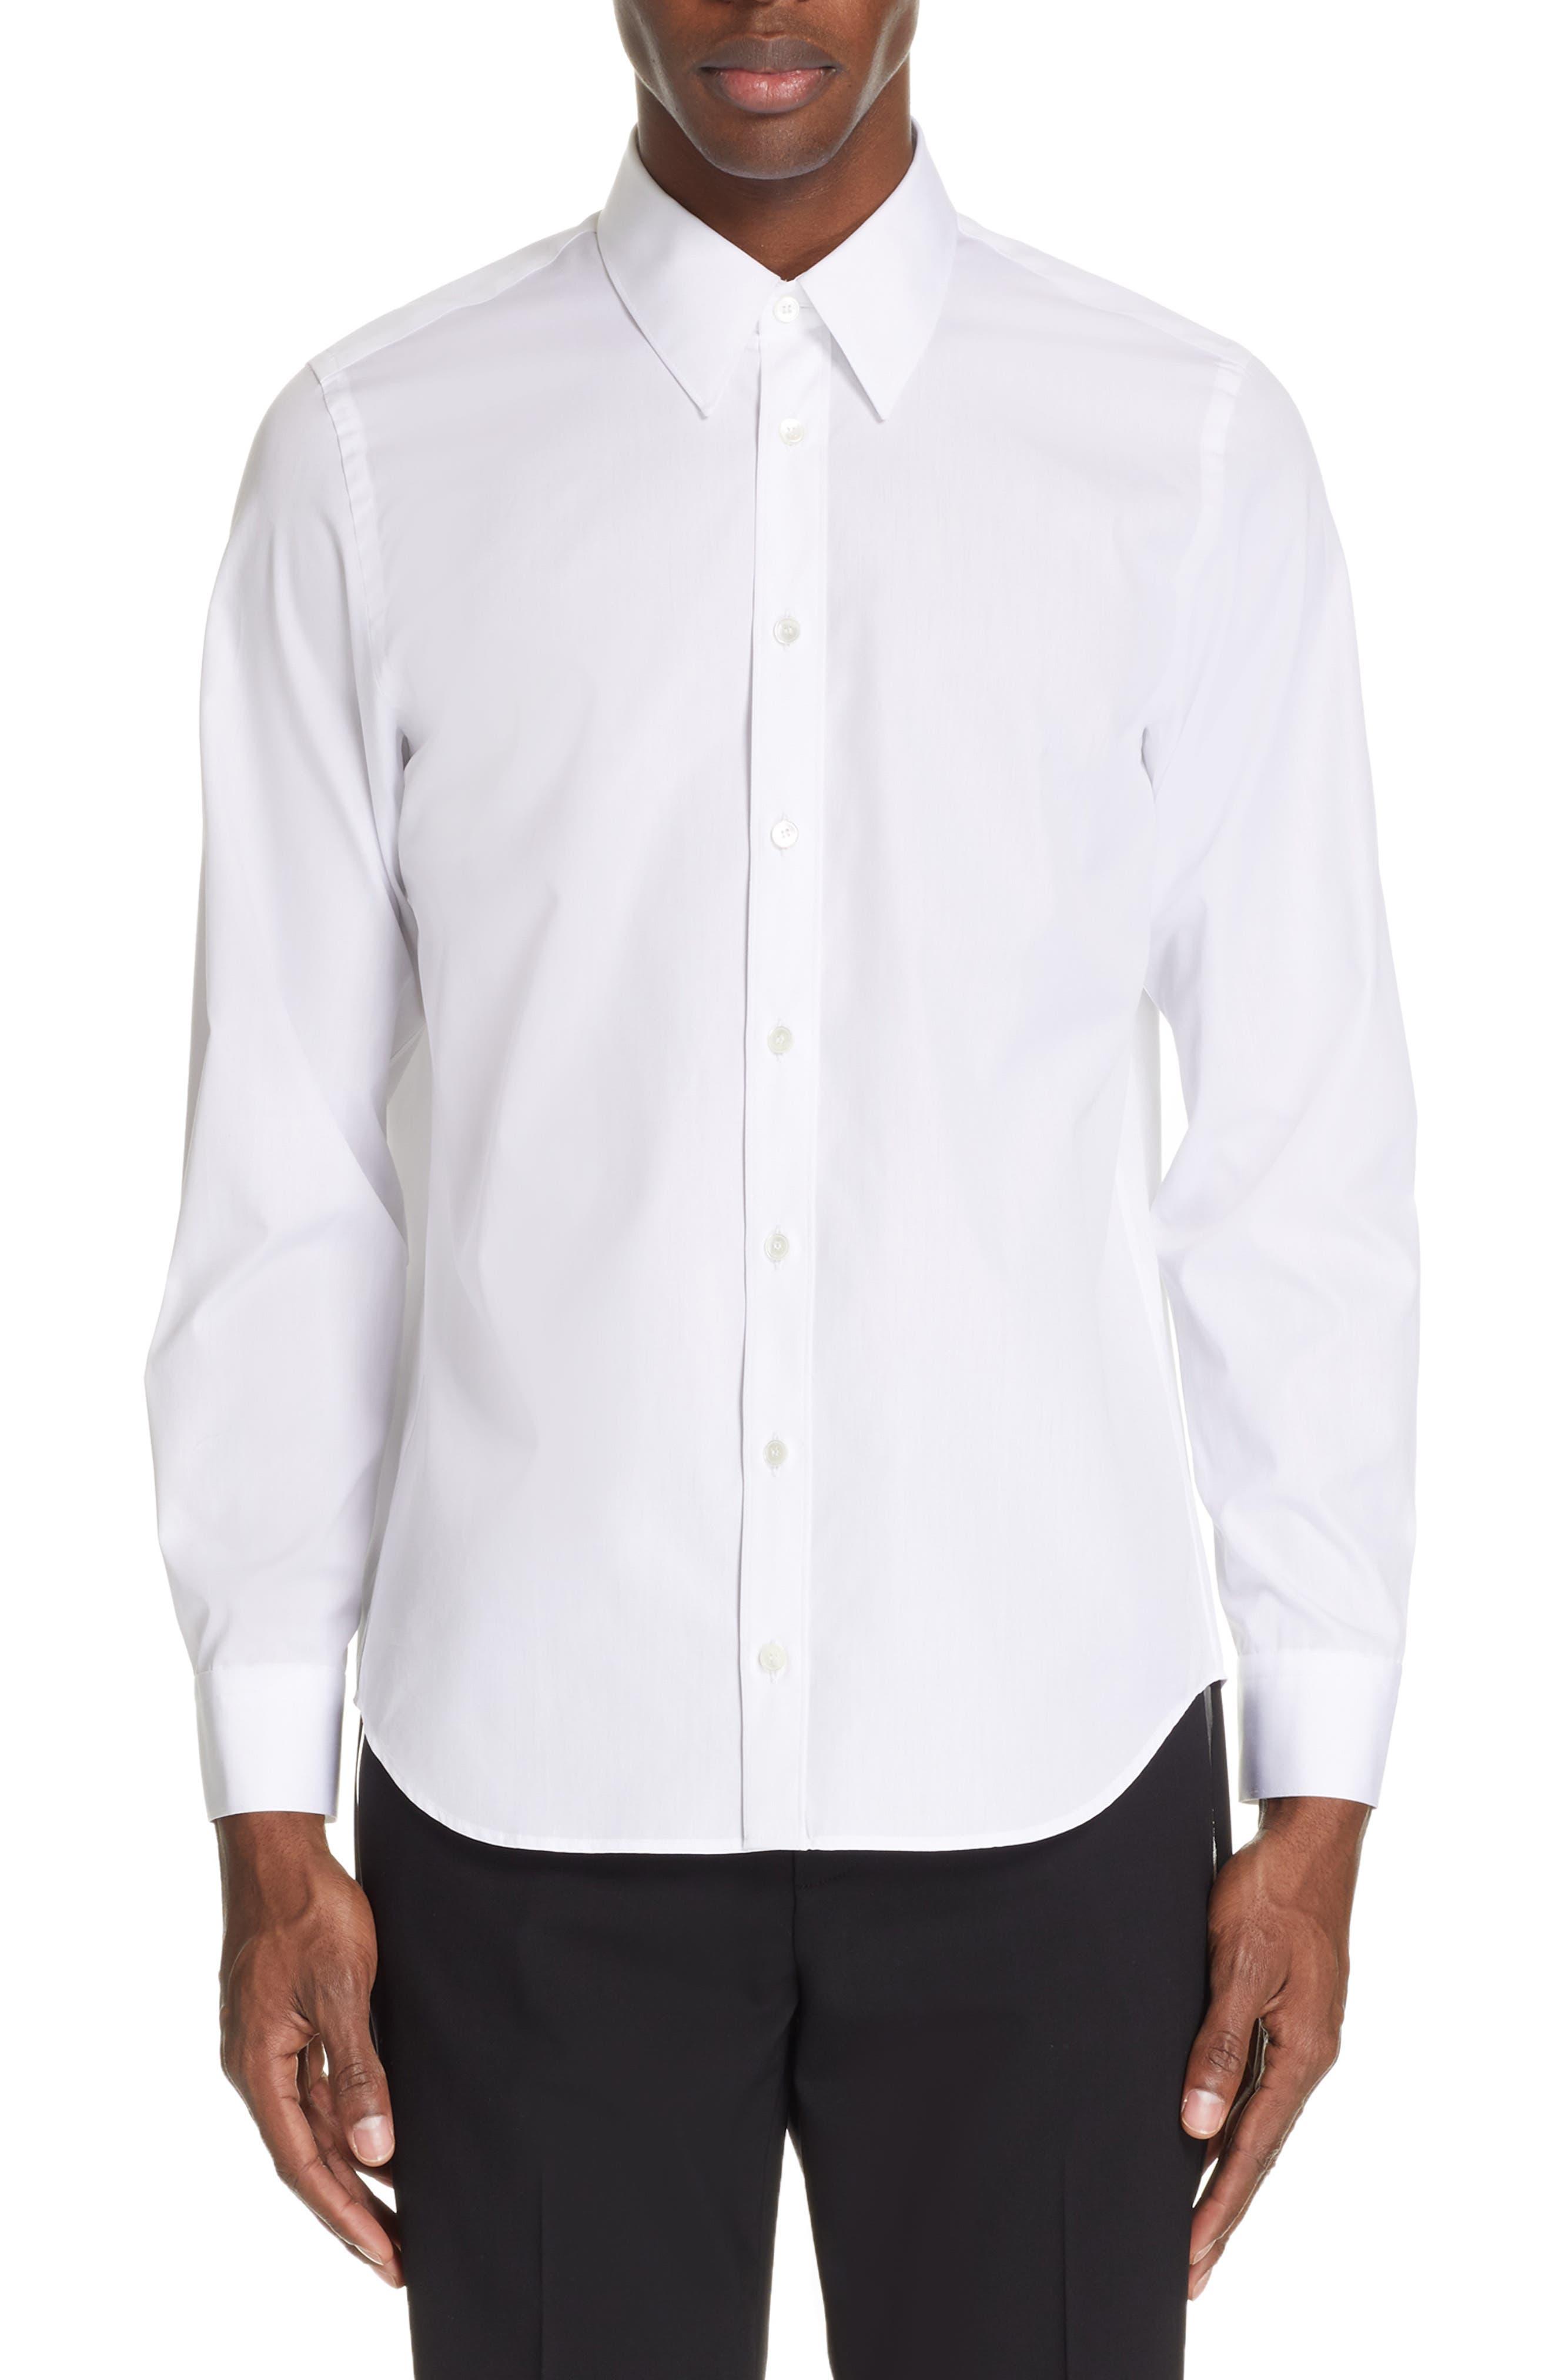 Logo Back Long Sleeve Woven Shirt, Main, color, WHITE AND BLACK